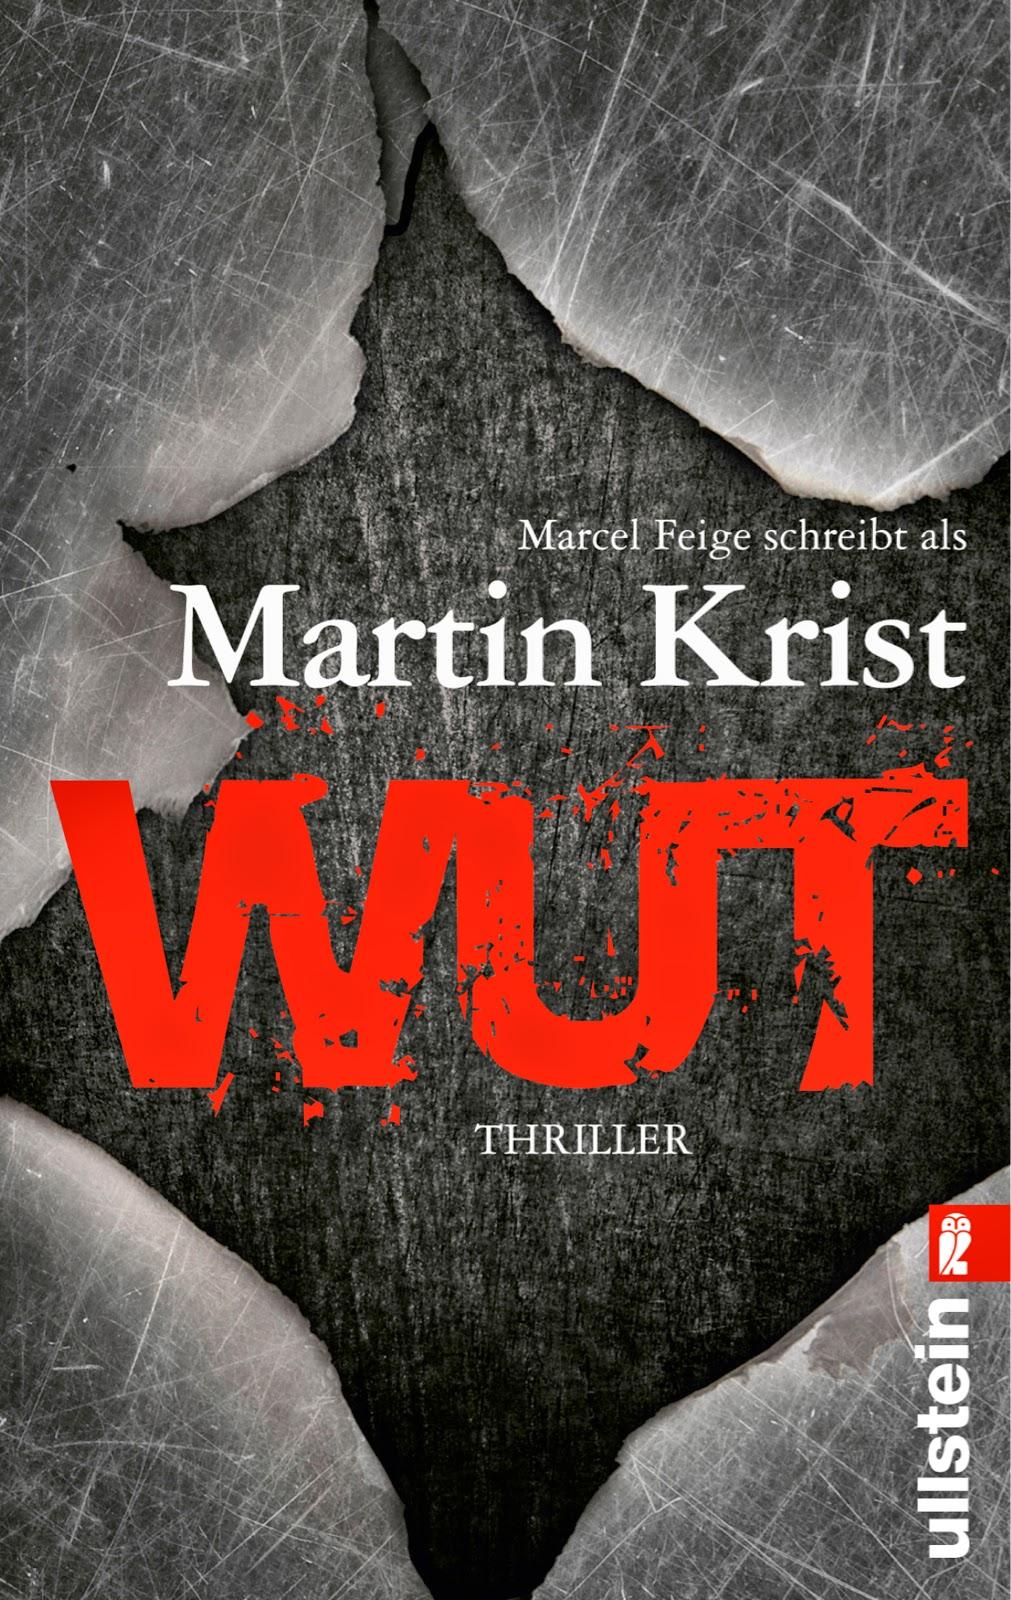 http://www.amazon.de/Wut-Ein-Paul-Kalkbrenner-Thriller-Martin-Krist-ebook/dp/B00BZ0OU5K/ref=sr_1_1?s=books&ie=UTF8&qid=1399921323&sr=1-1&keywords=wut+martin+krist